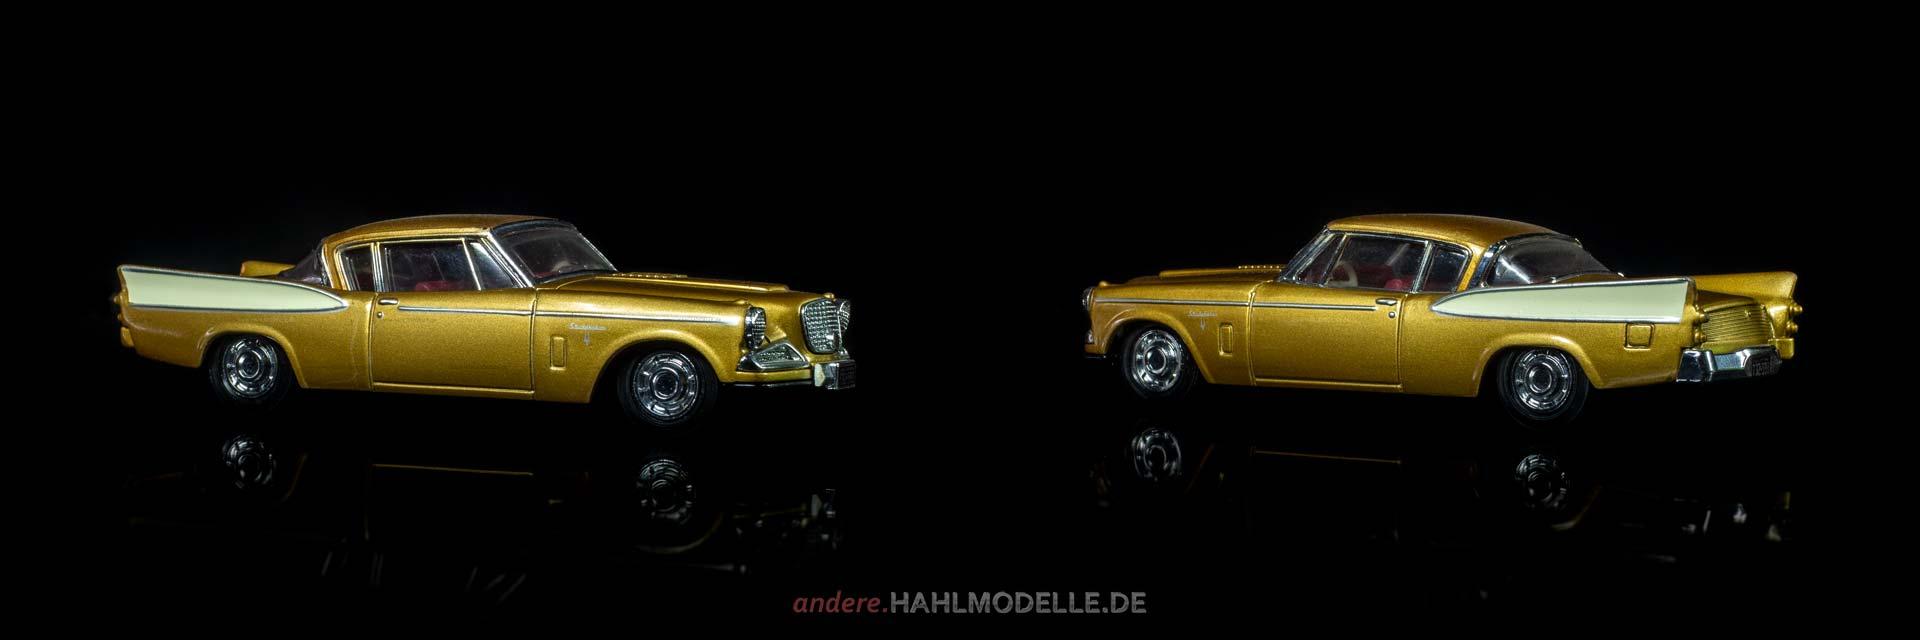 Studebaker Golden Hawk | Coupé | Matchbox / Dinky | 1:43 | www.andere.hahlmodelle.de